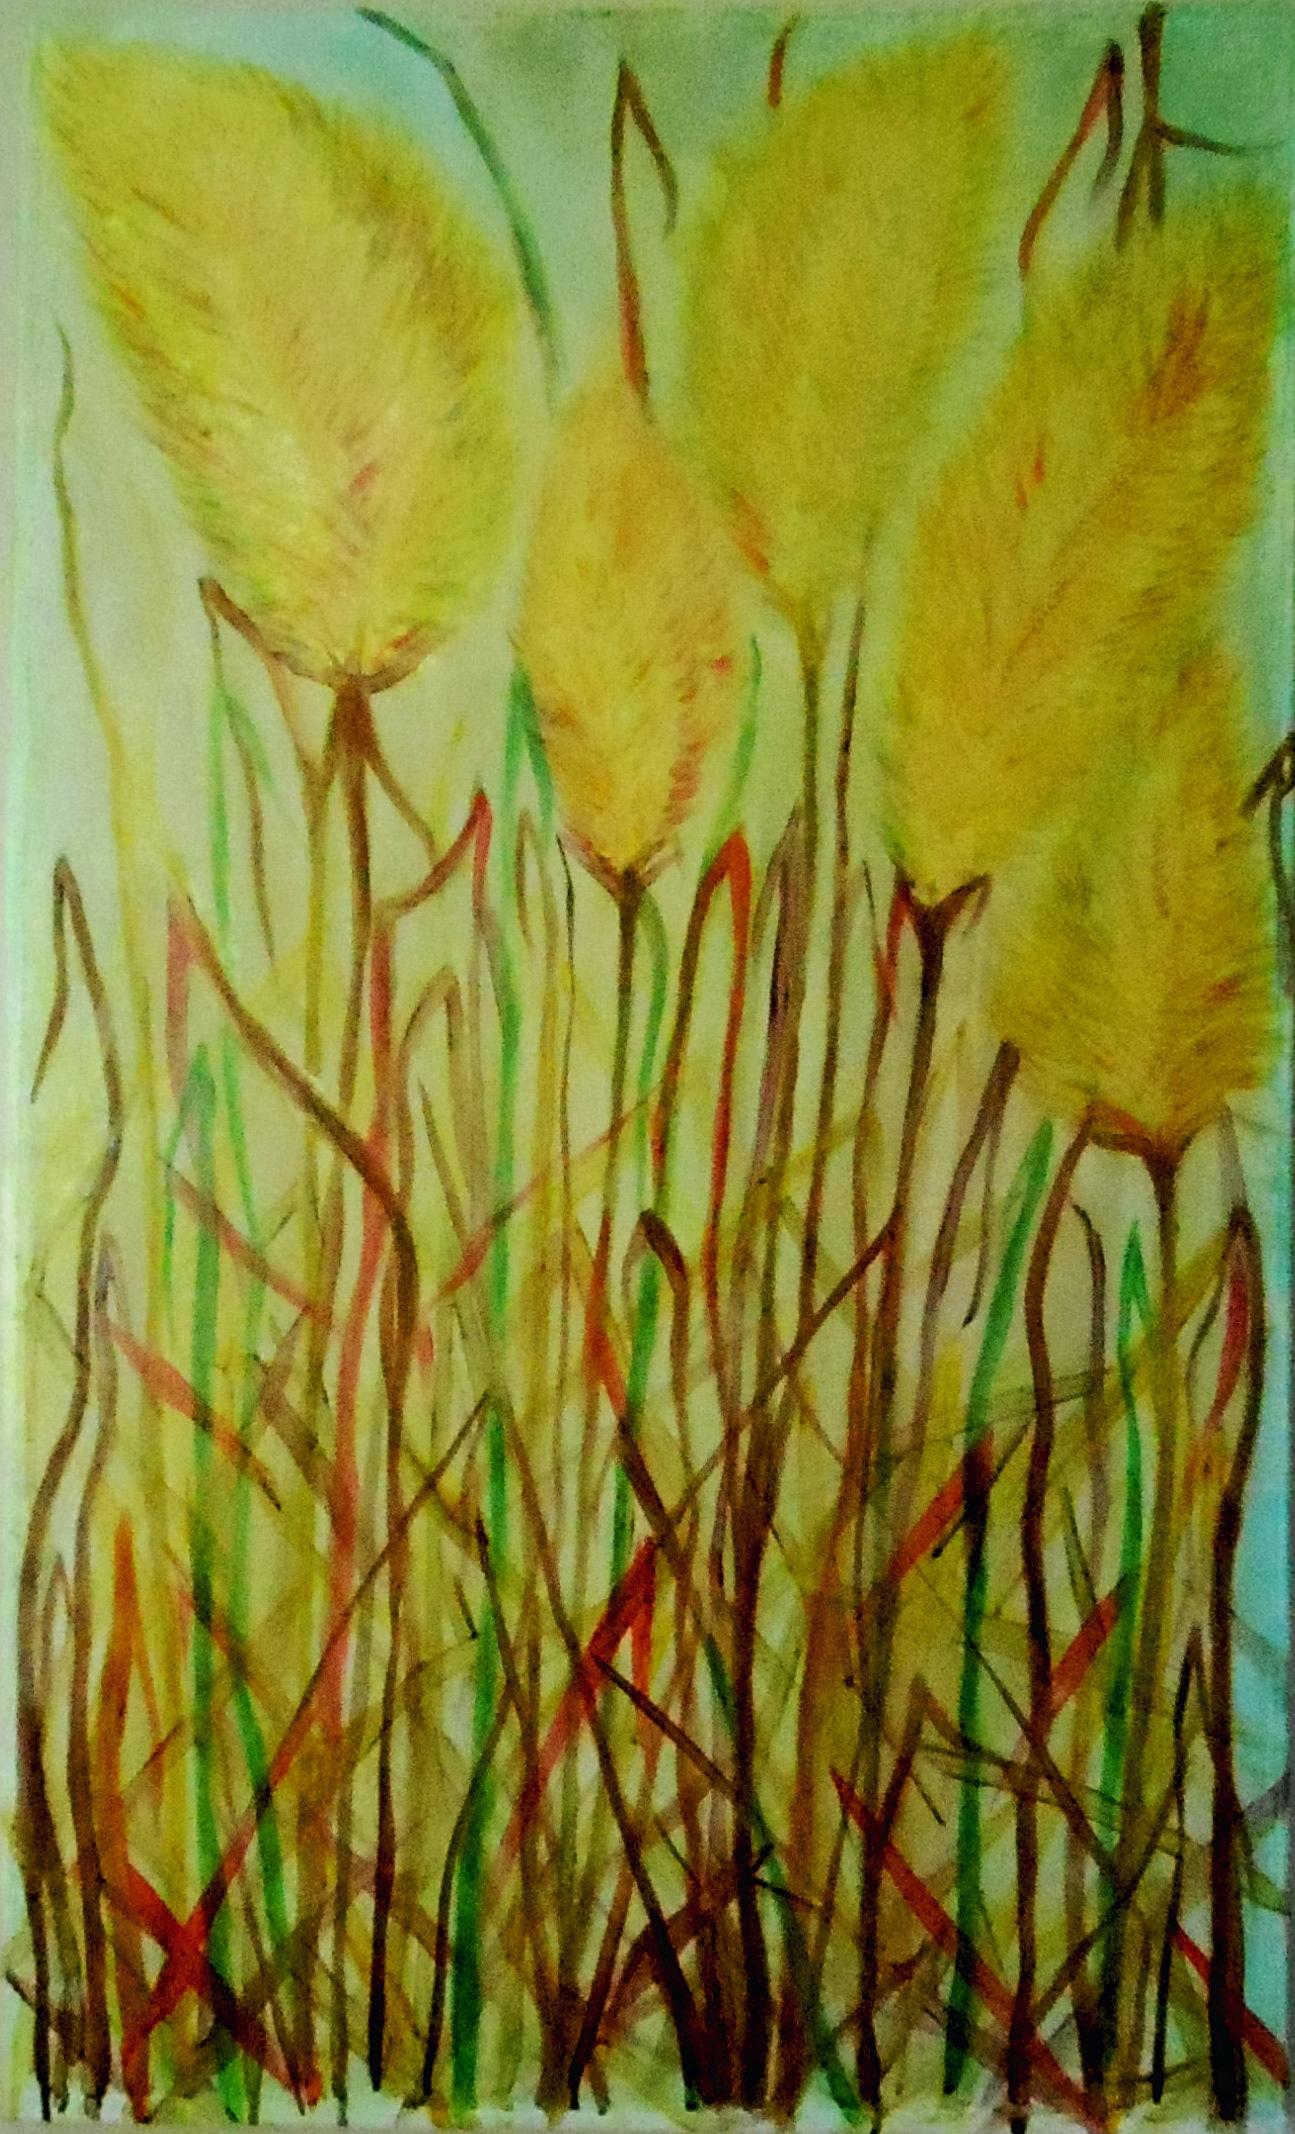 new yellow broome grass.jpg